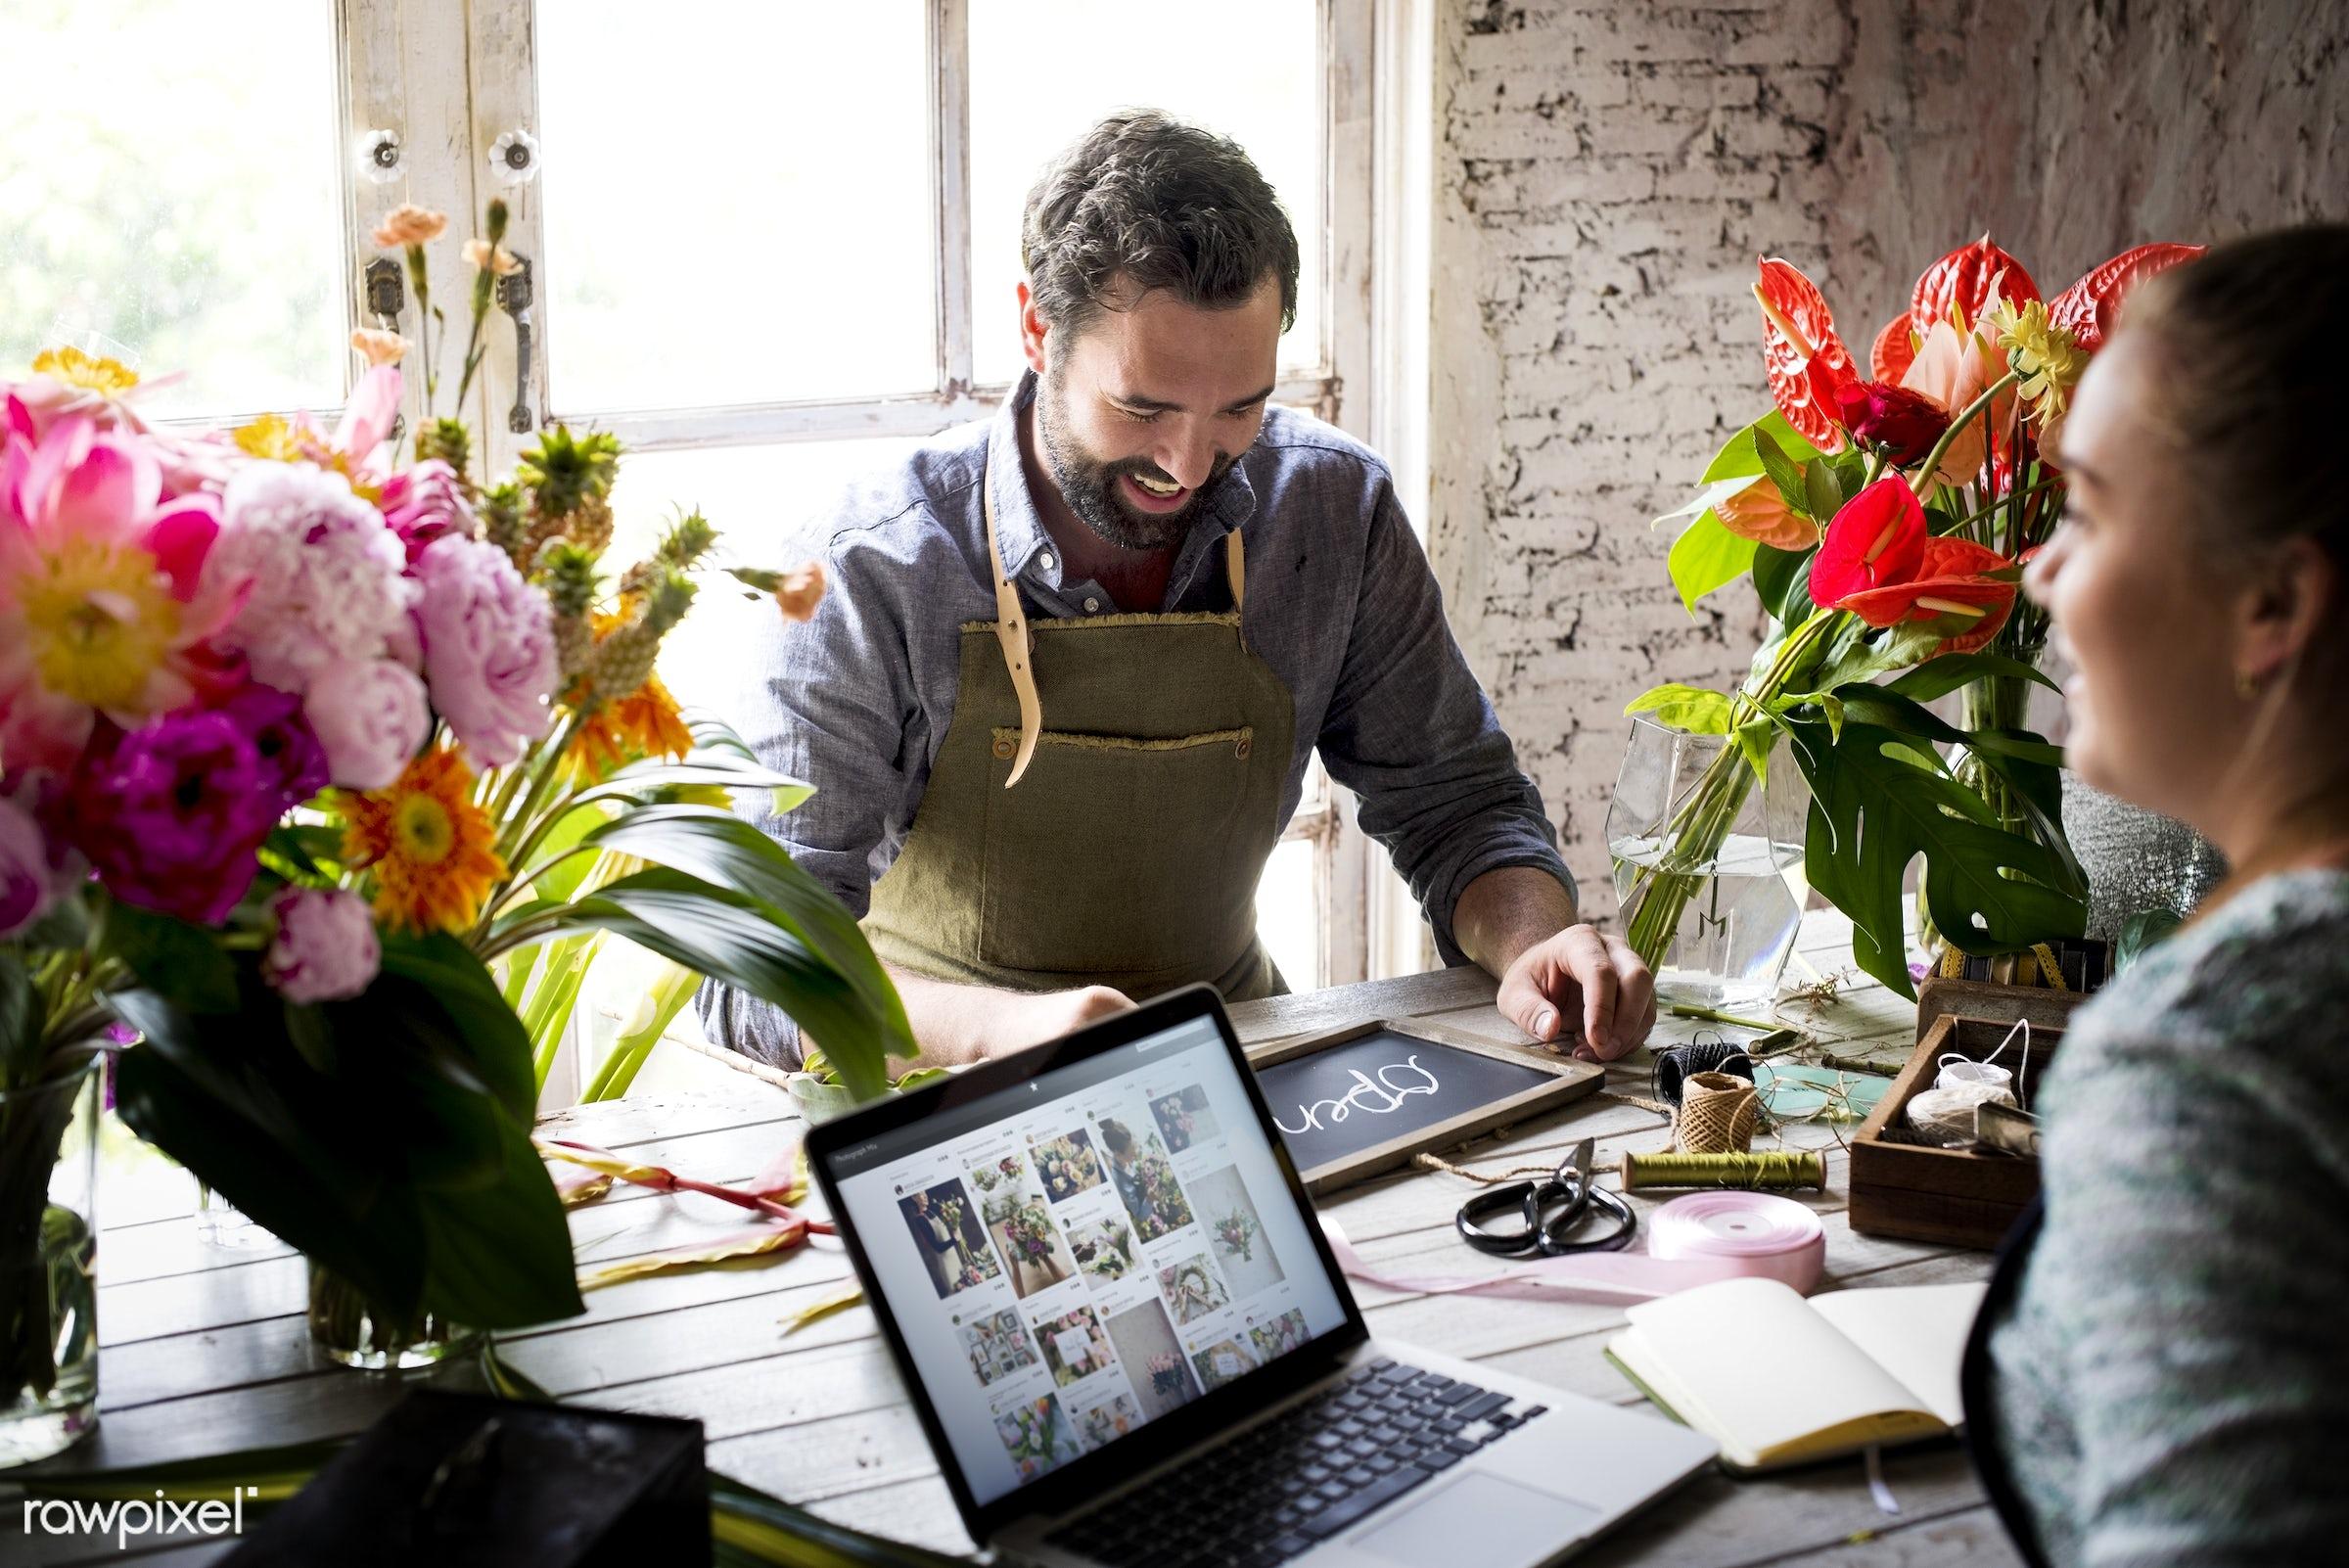 plant, technology, decoration, flora, refreshment, group of people, leisure, florist, recreational, fresh, laptop, partner,...